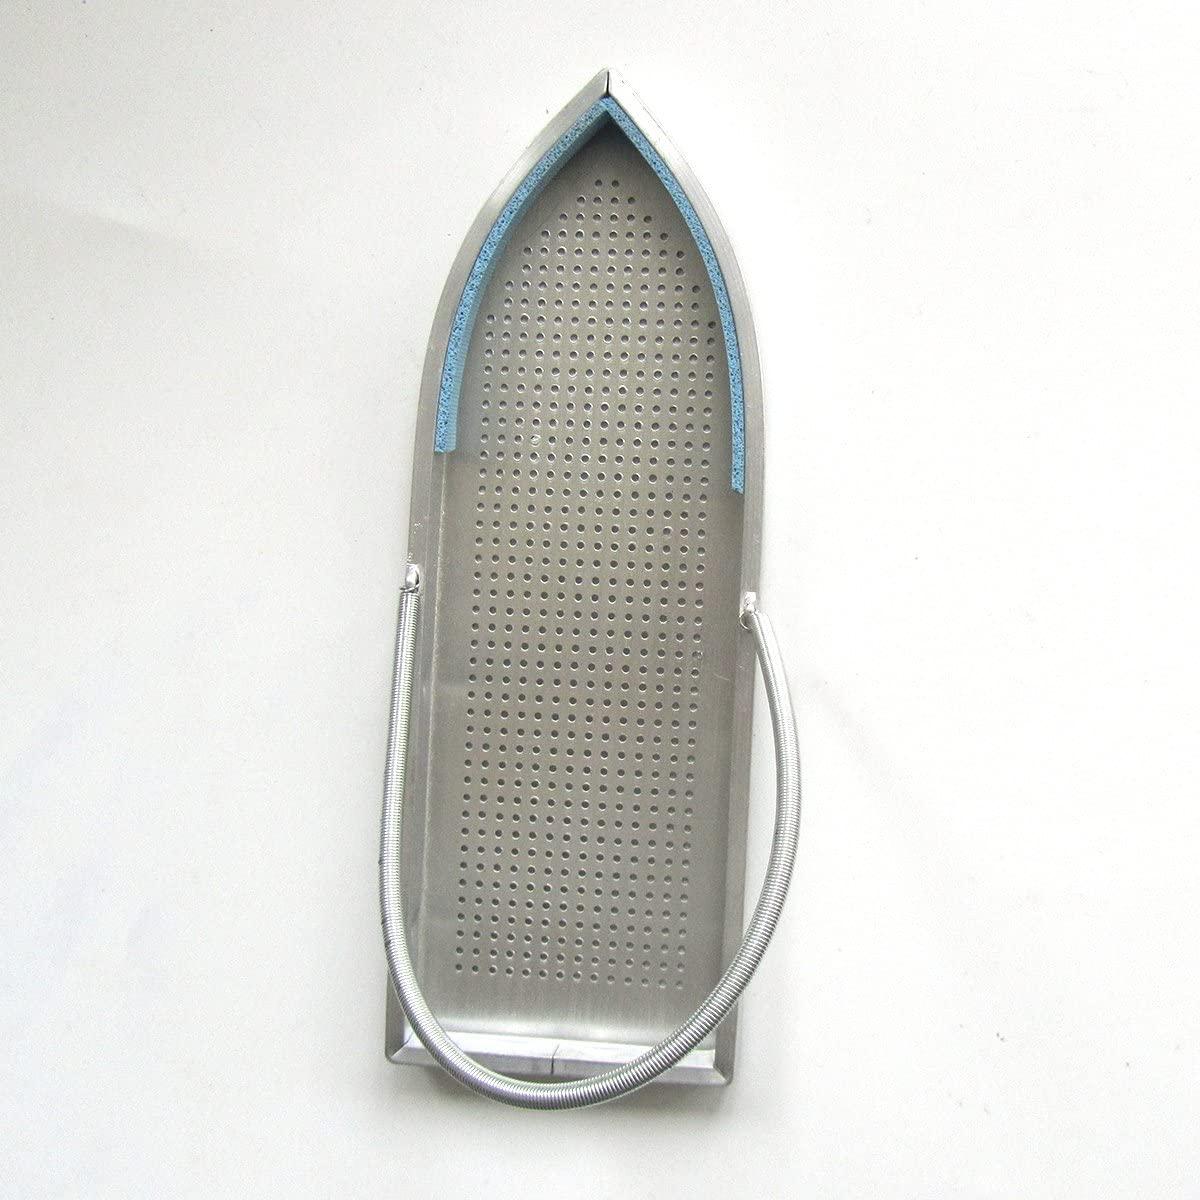 KUNPENG - a Brand New Teflon Iron Shoe, for STB-295 1PCS